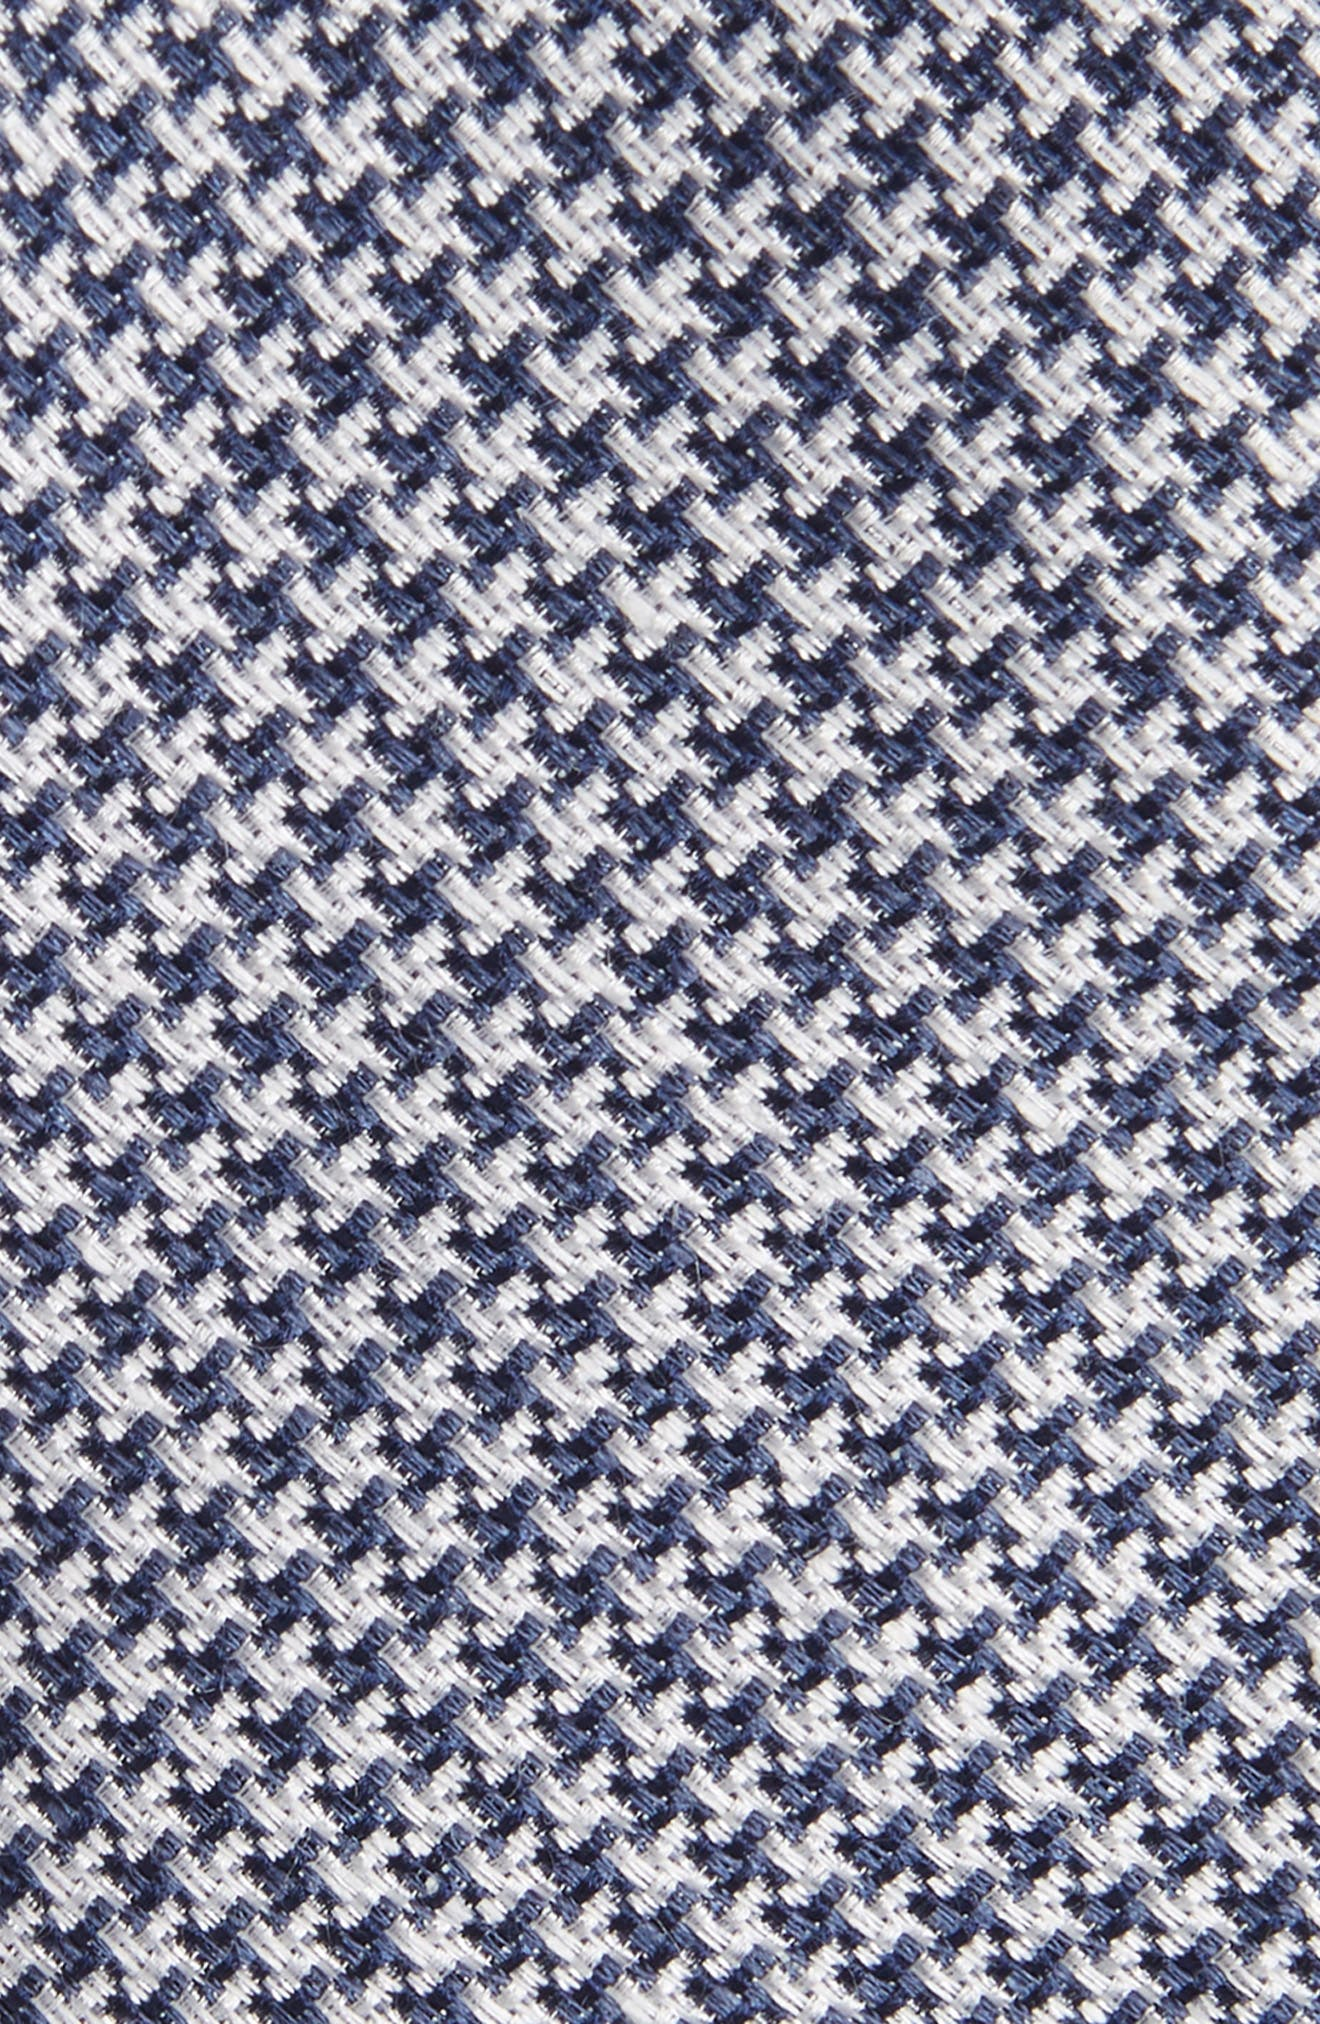 Wyden Linen & Silk Tie,                             Alternate thumbnail 2, color,                             Navy